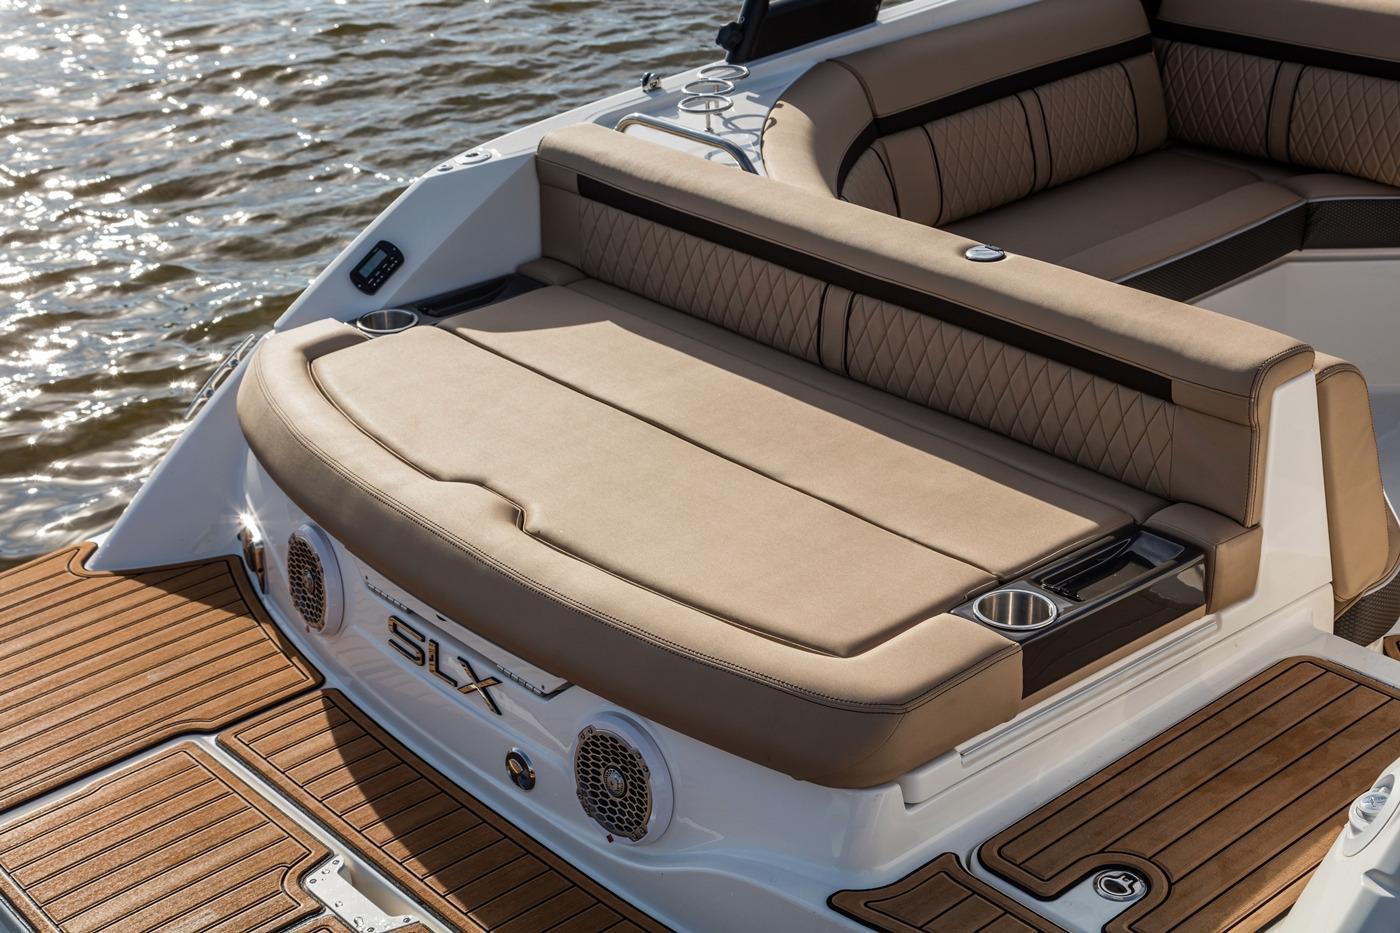 Sea RaySLX 230